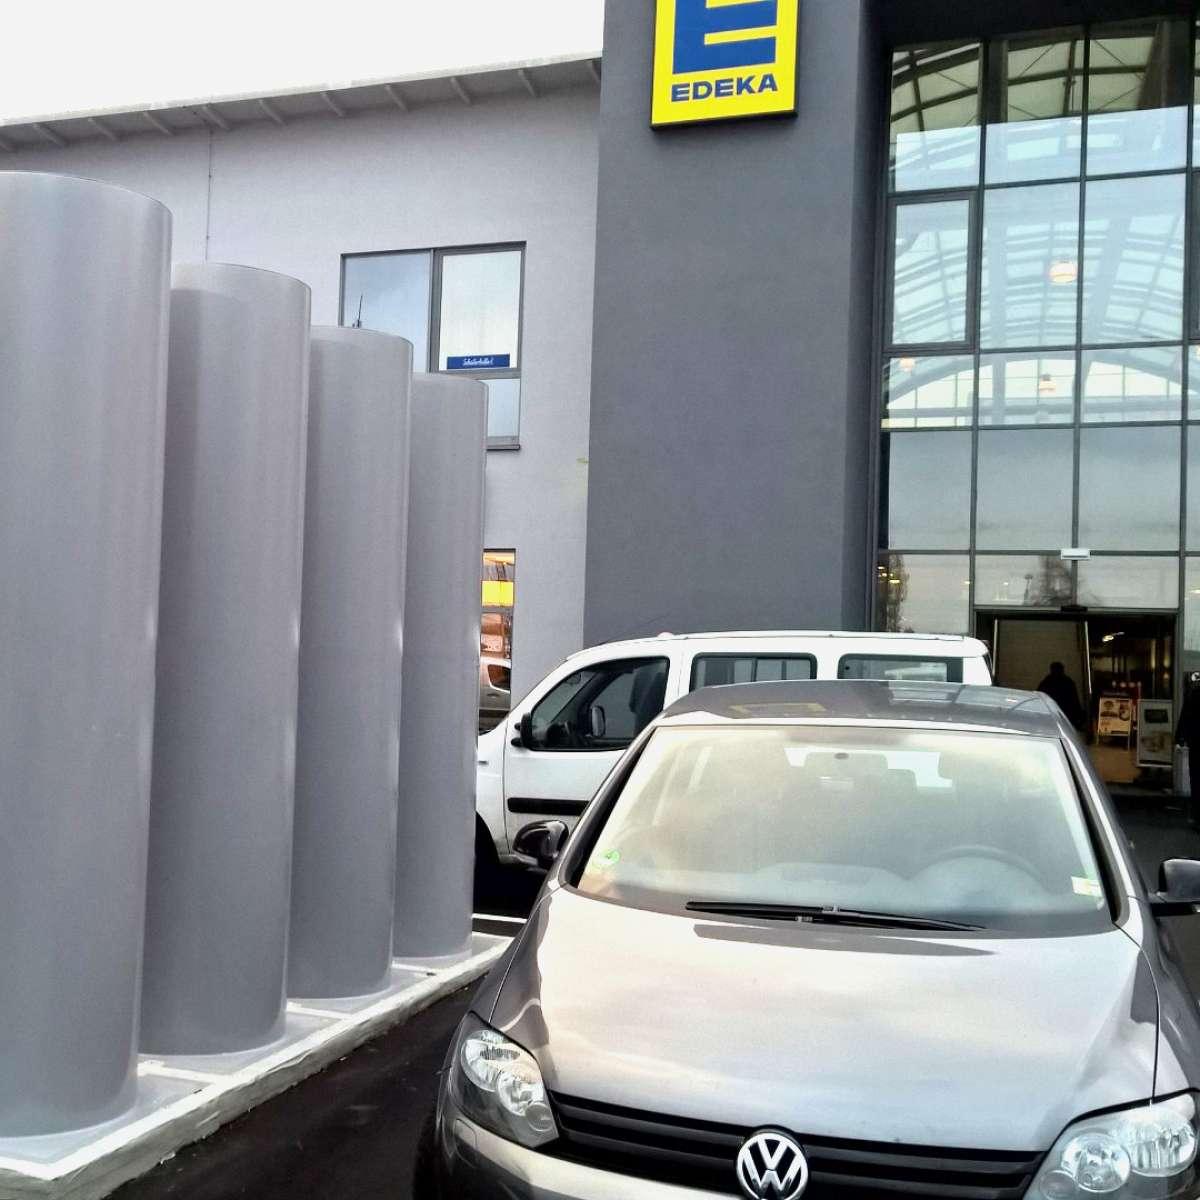 Max Center Regenstauf | Regenstauf • Edeka supermarket 1 x Taurus 45,000m³/h, air supply via louvred ventilator Lyra_A incl. insect protection grating. Underground garage 4 x Taurus 13,000 m³/h, air supply via doors and windows.